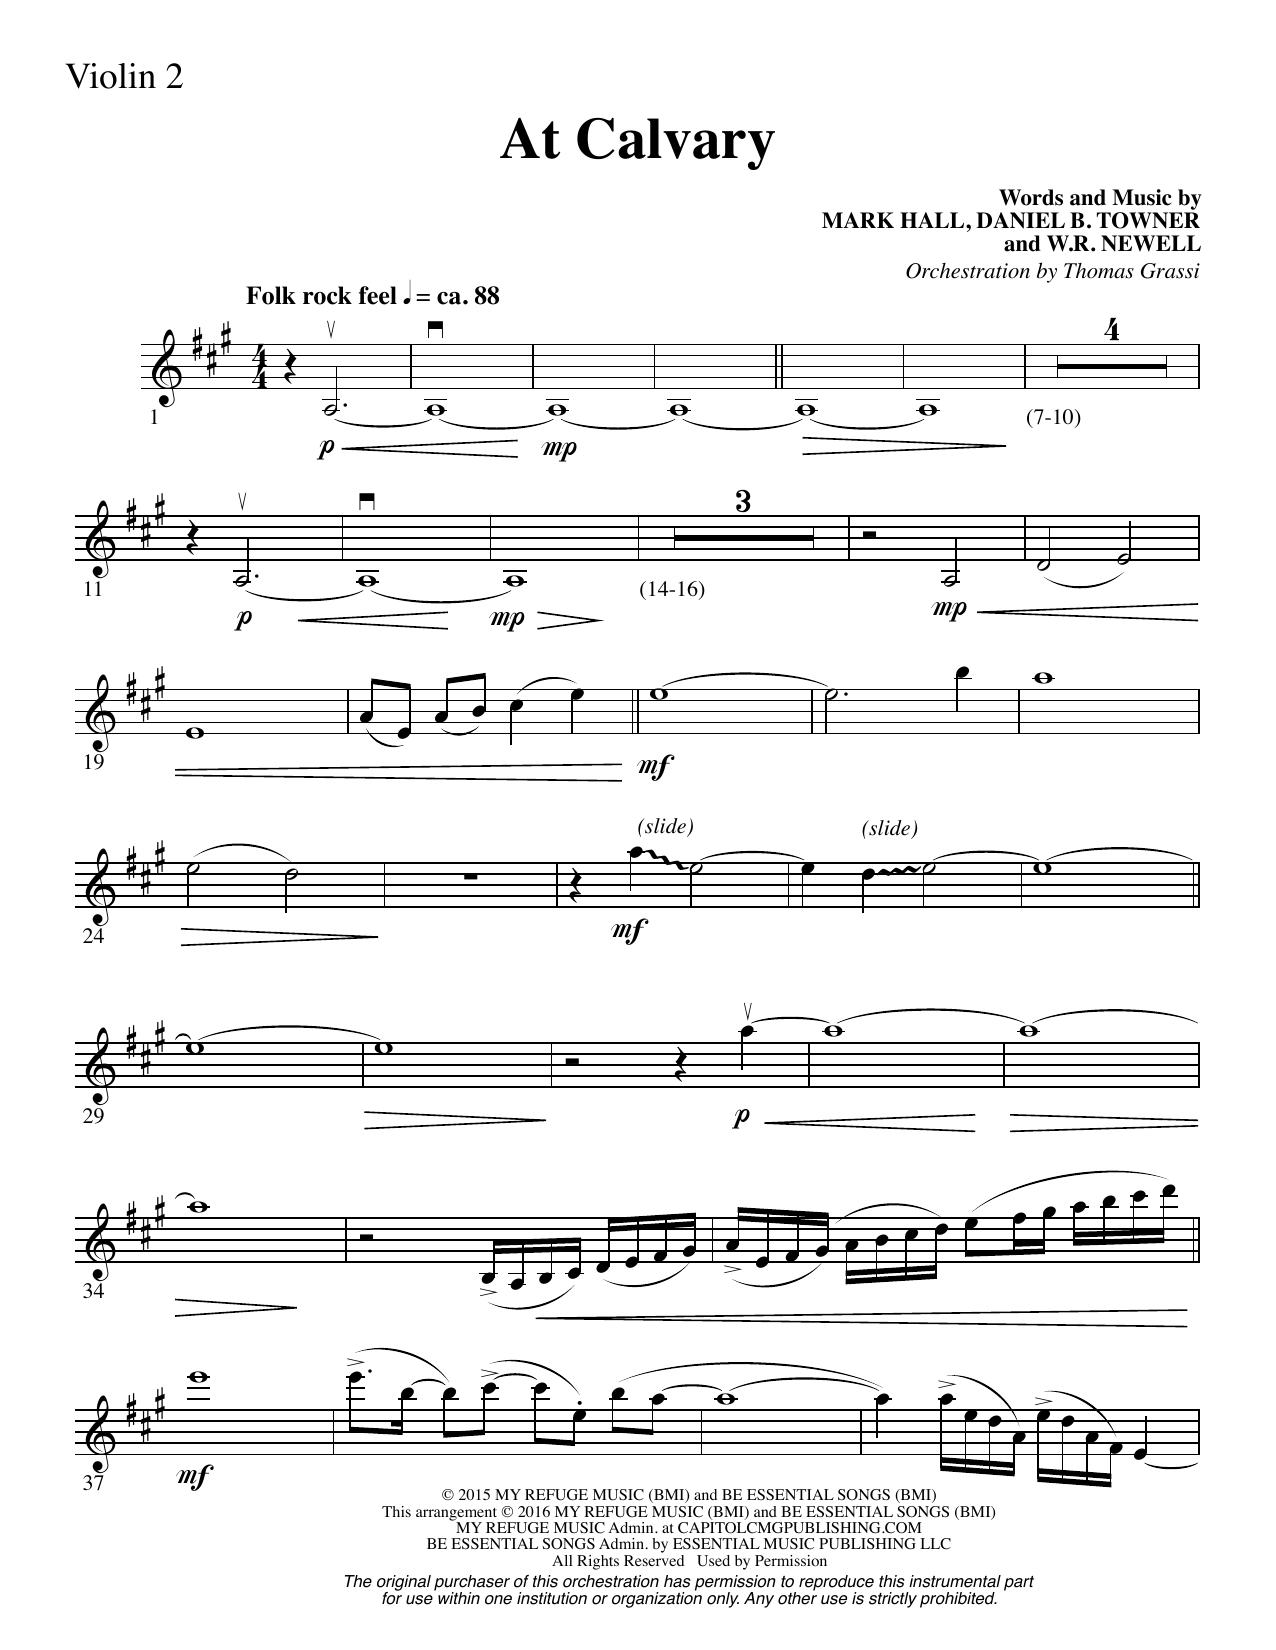 W.R. Newell - At Calvary - Violin 2